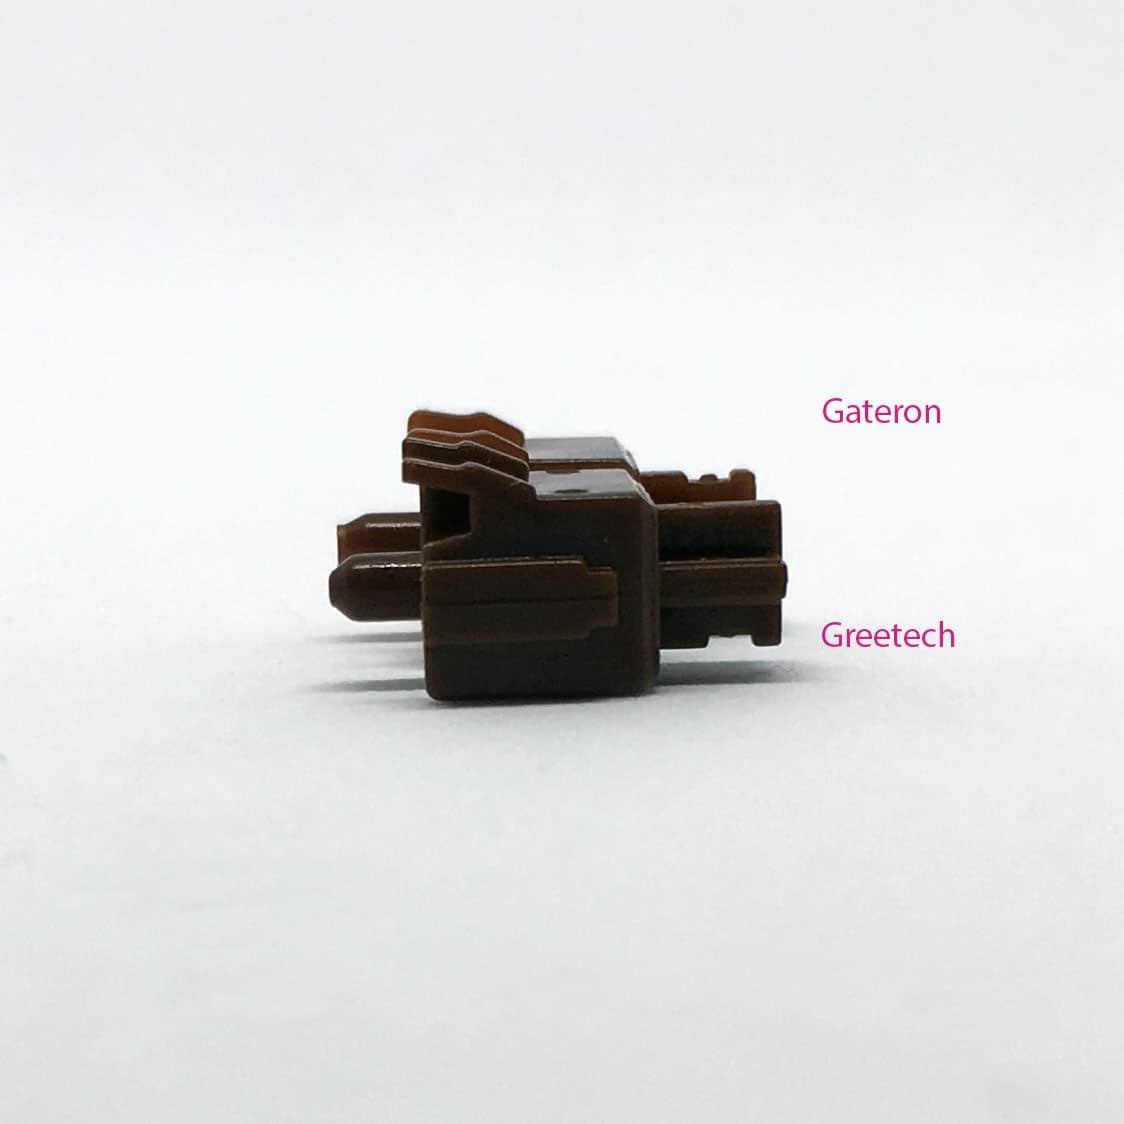 Greetech Gateron Comparison